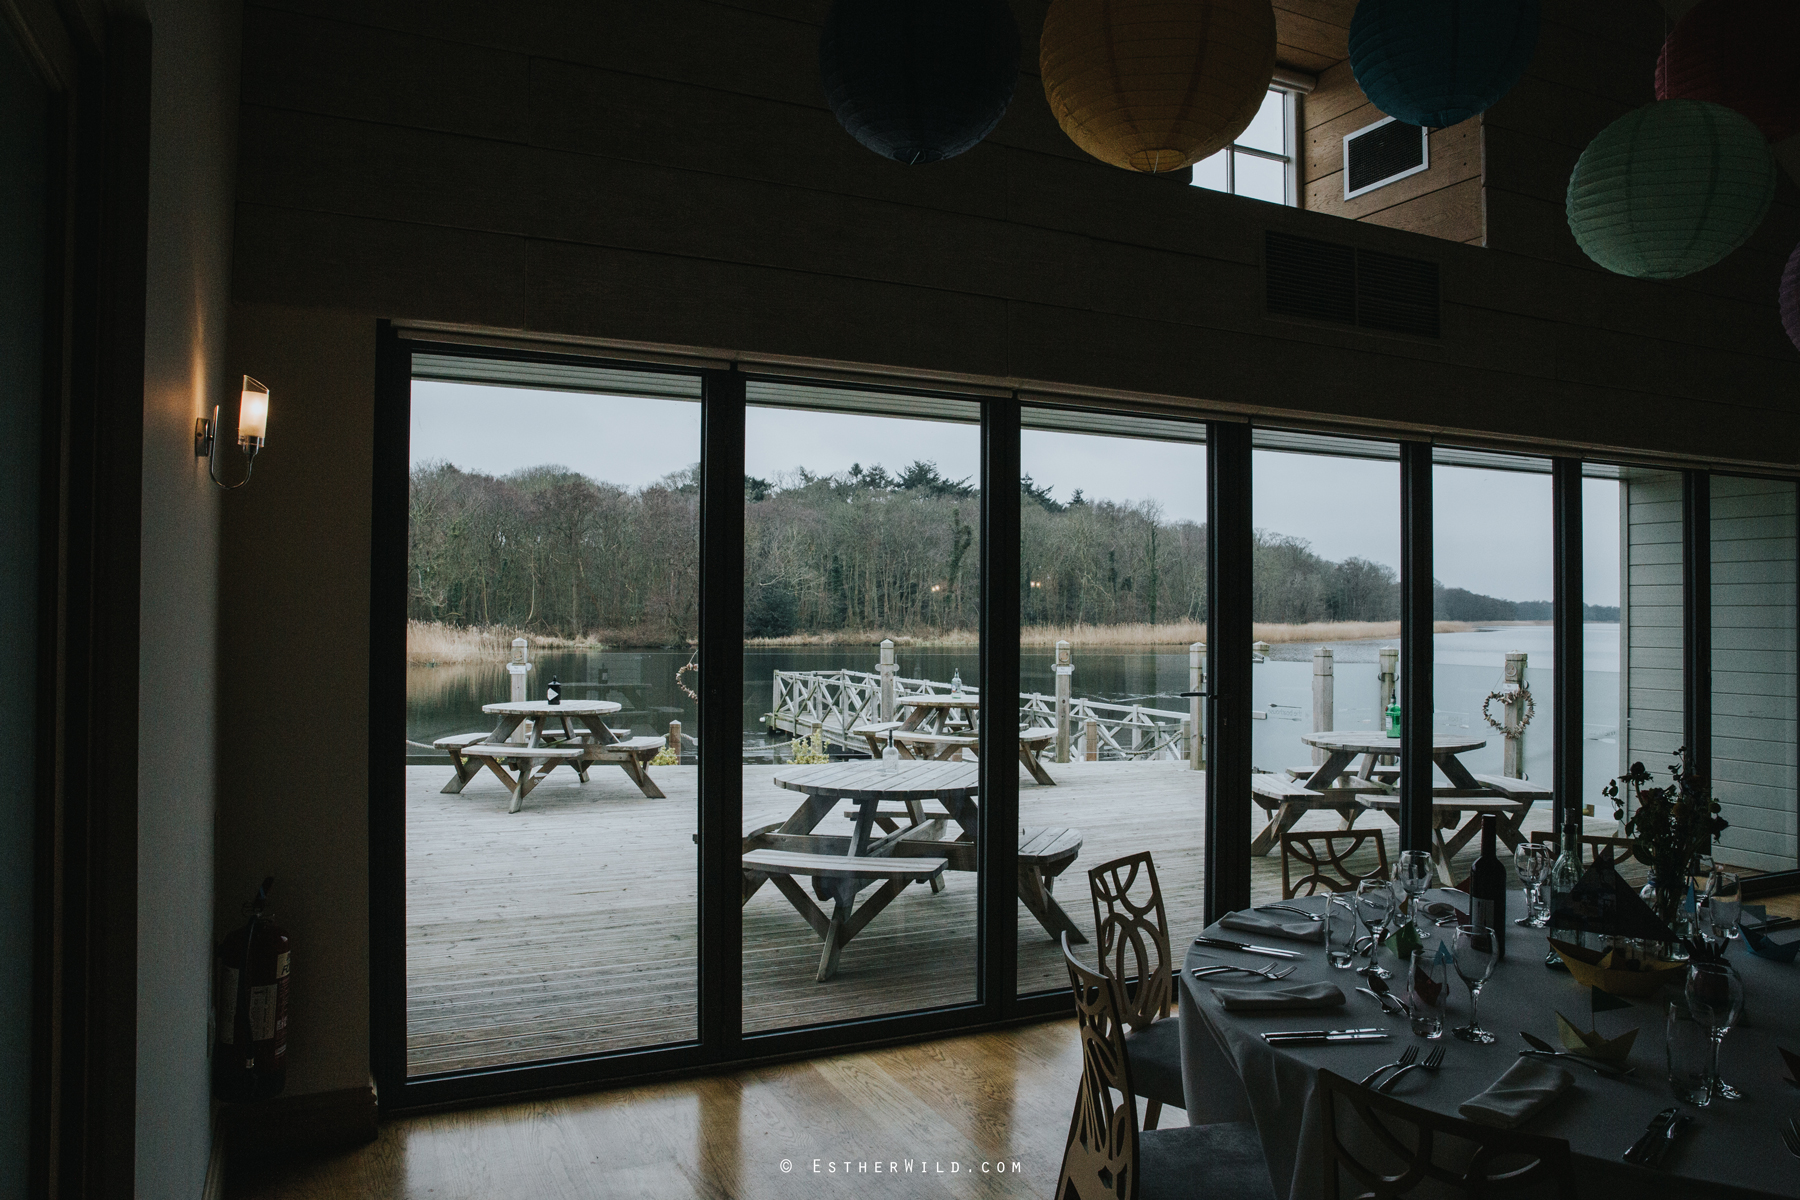 The_BoatHouse_Wedding_Venue_Ormesby_Norfolk_Broads_Boat_Wedding_Photography_Esther_Wild_Photographer_IMG_0163.jpg